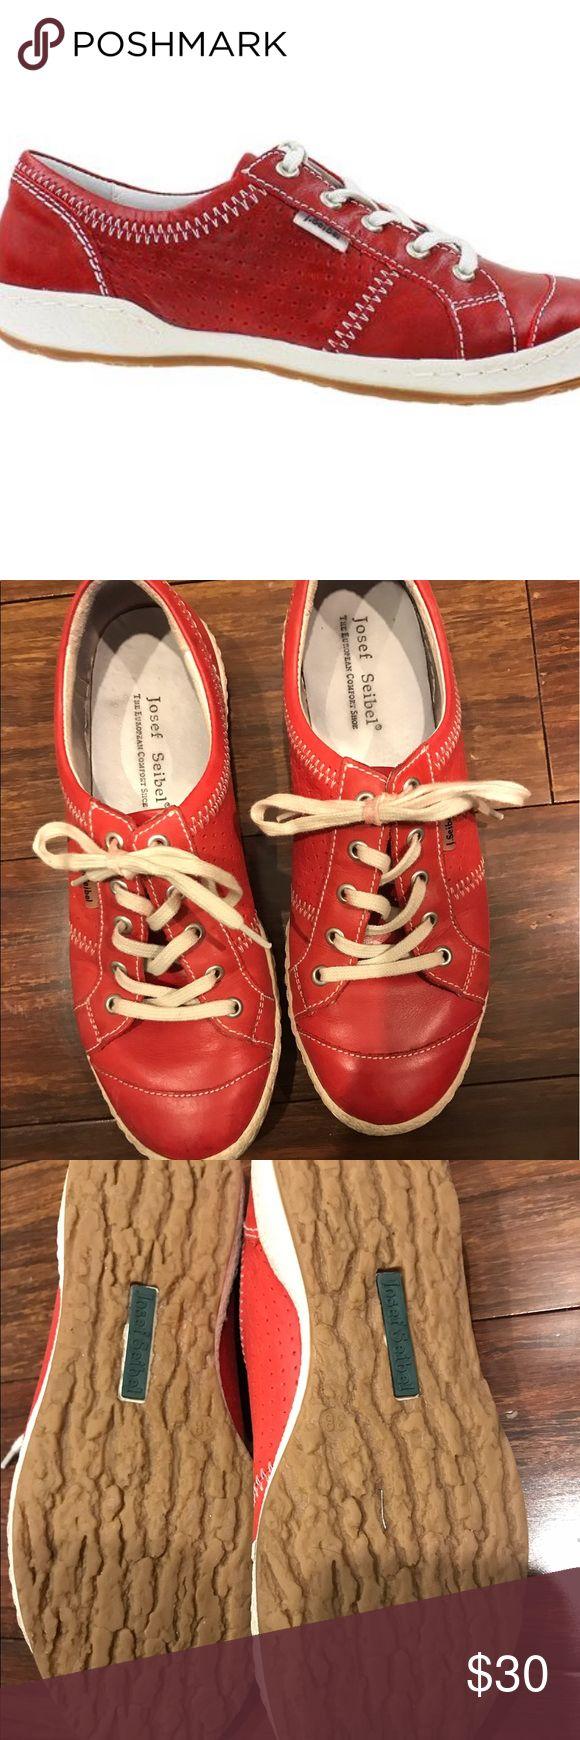 Josef Seibel red sneaker Super cute and comfortable red leather sneaker. Josef Seibel Shoes Sneakers